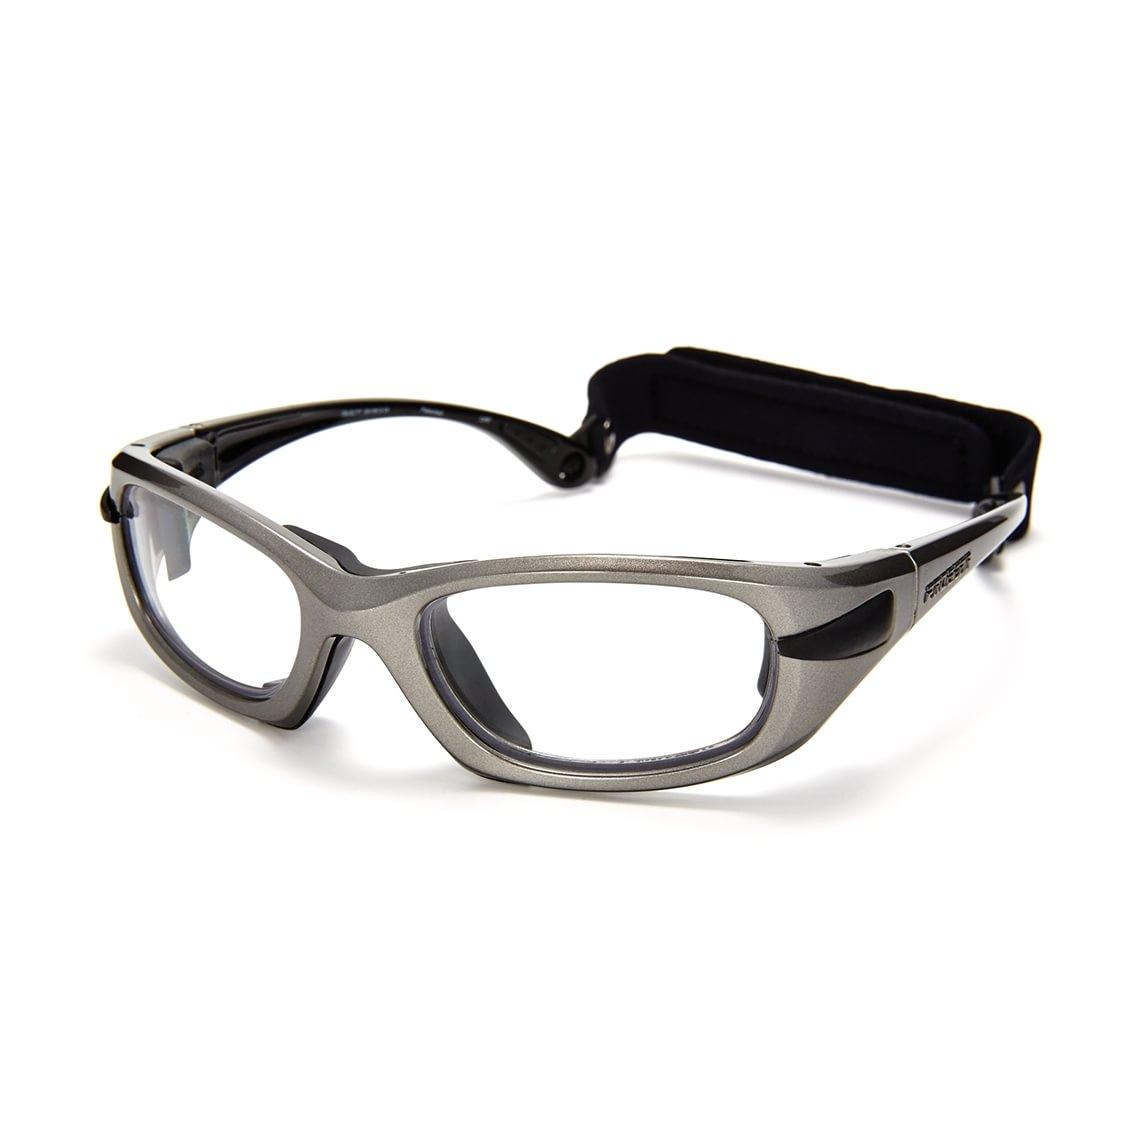 Progear Eyeguard Medium EG-M 1020-3